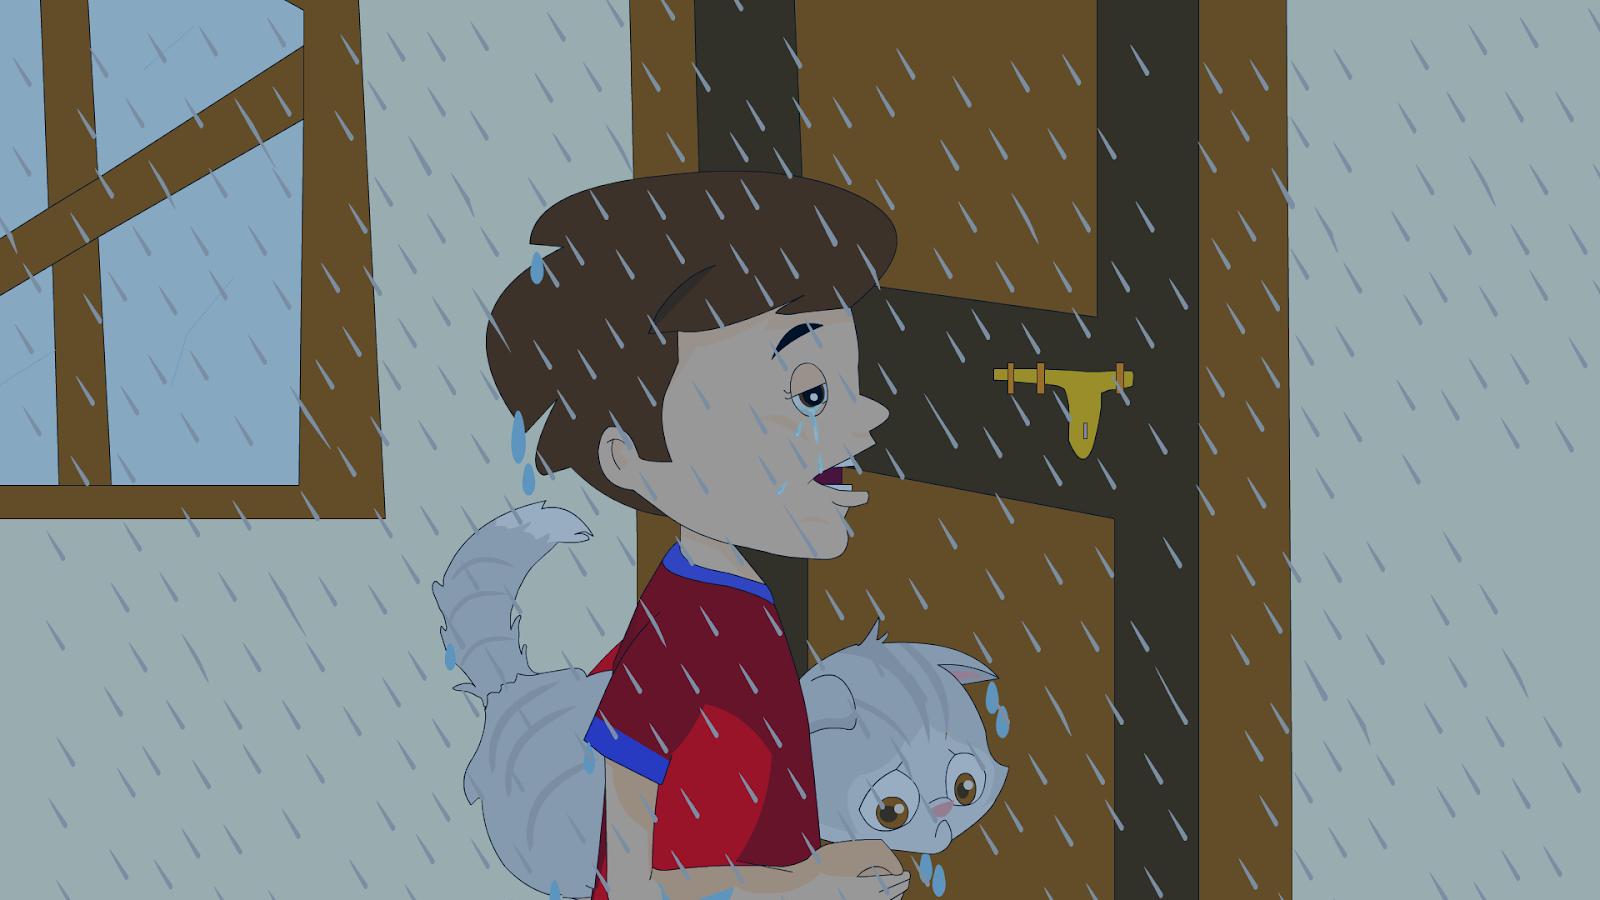 Little Tinku - Moral Story For Kids